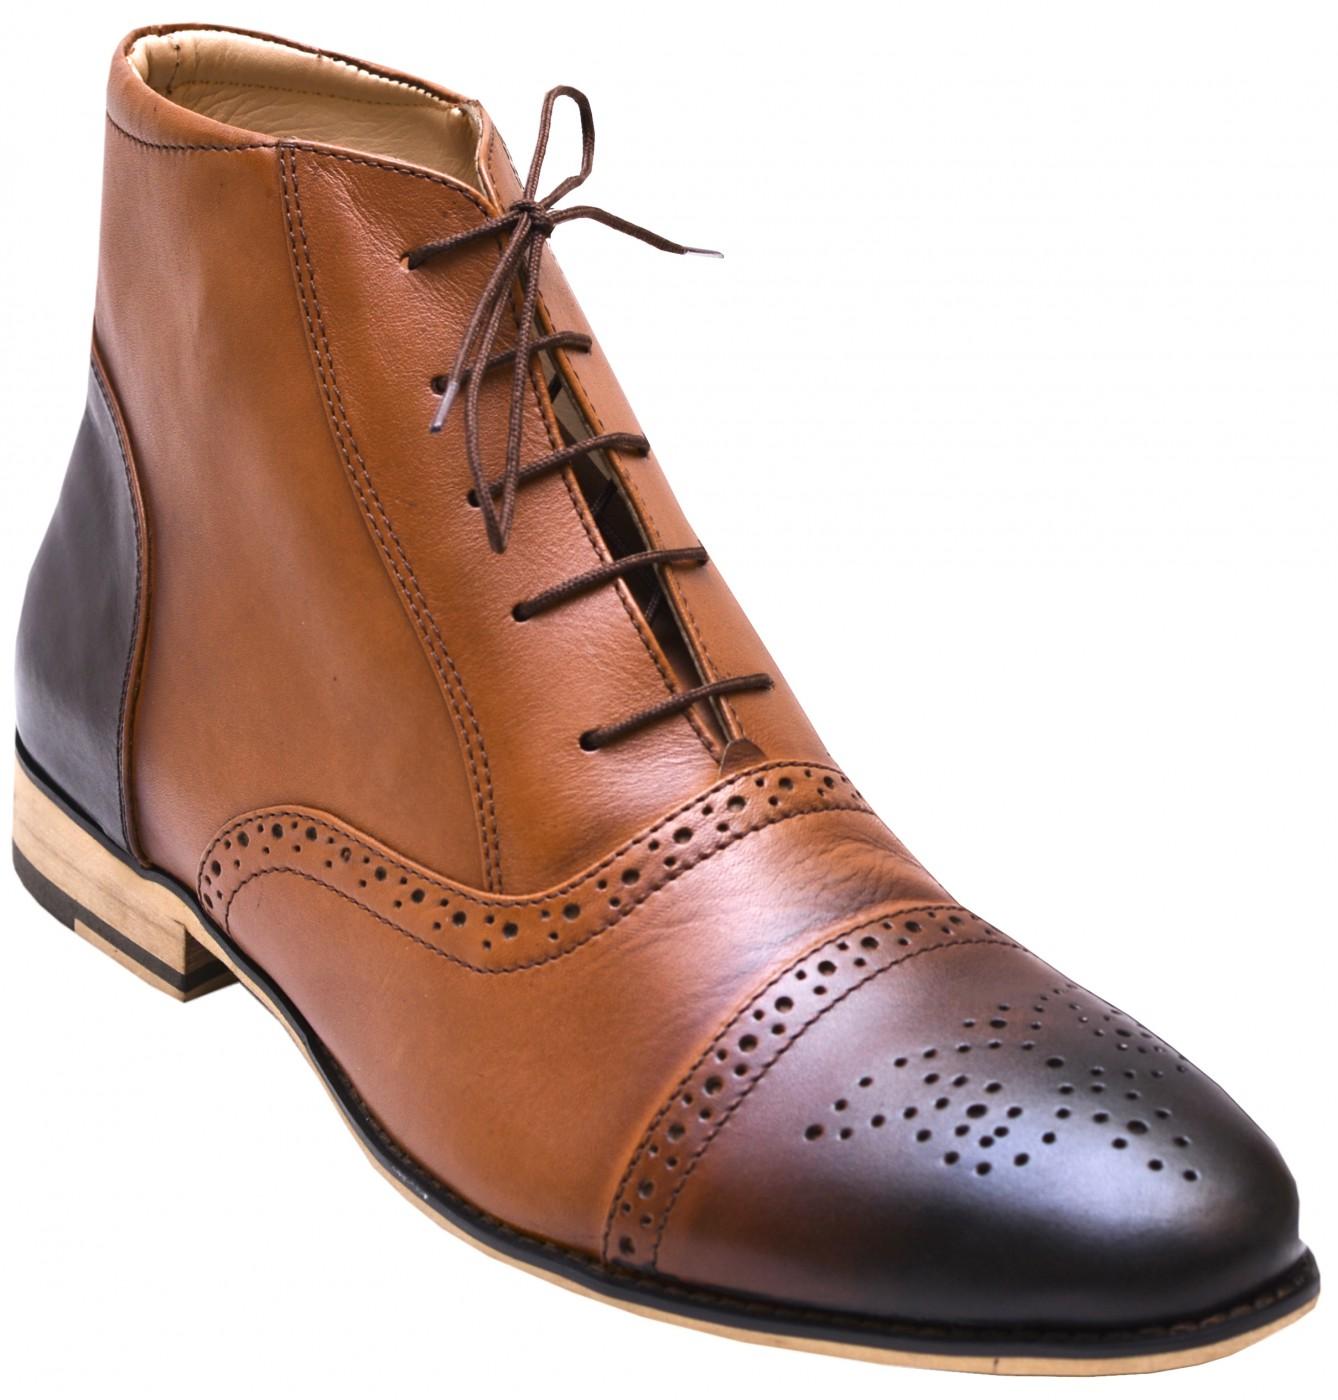 Business Schuhe Brogues Stiefelette Lederschuhe mit Ledersohle Schuhe braun